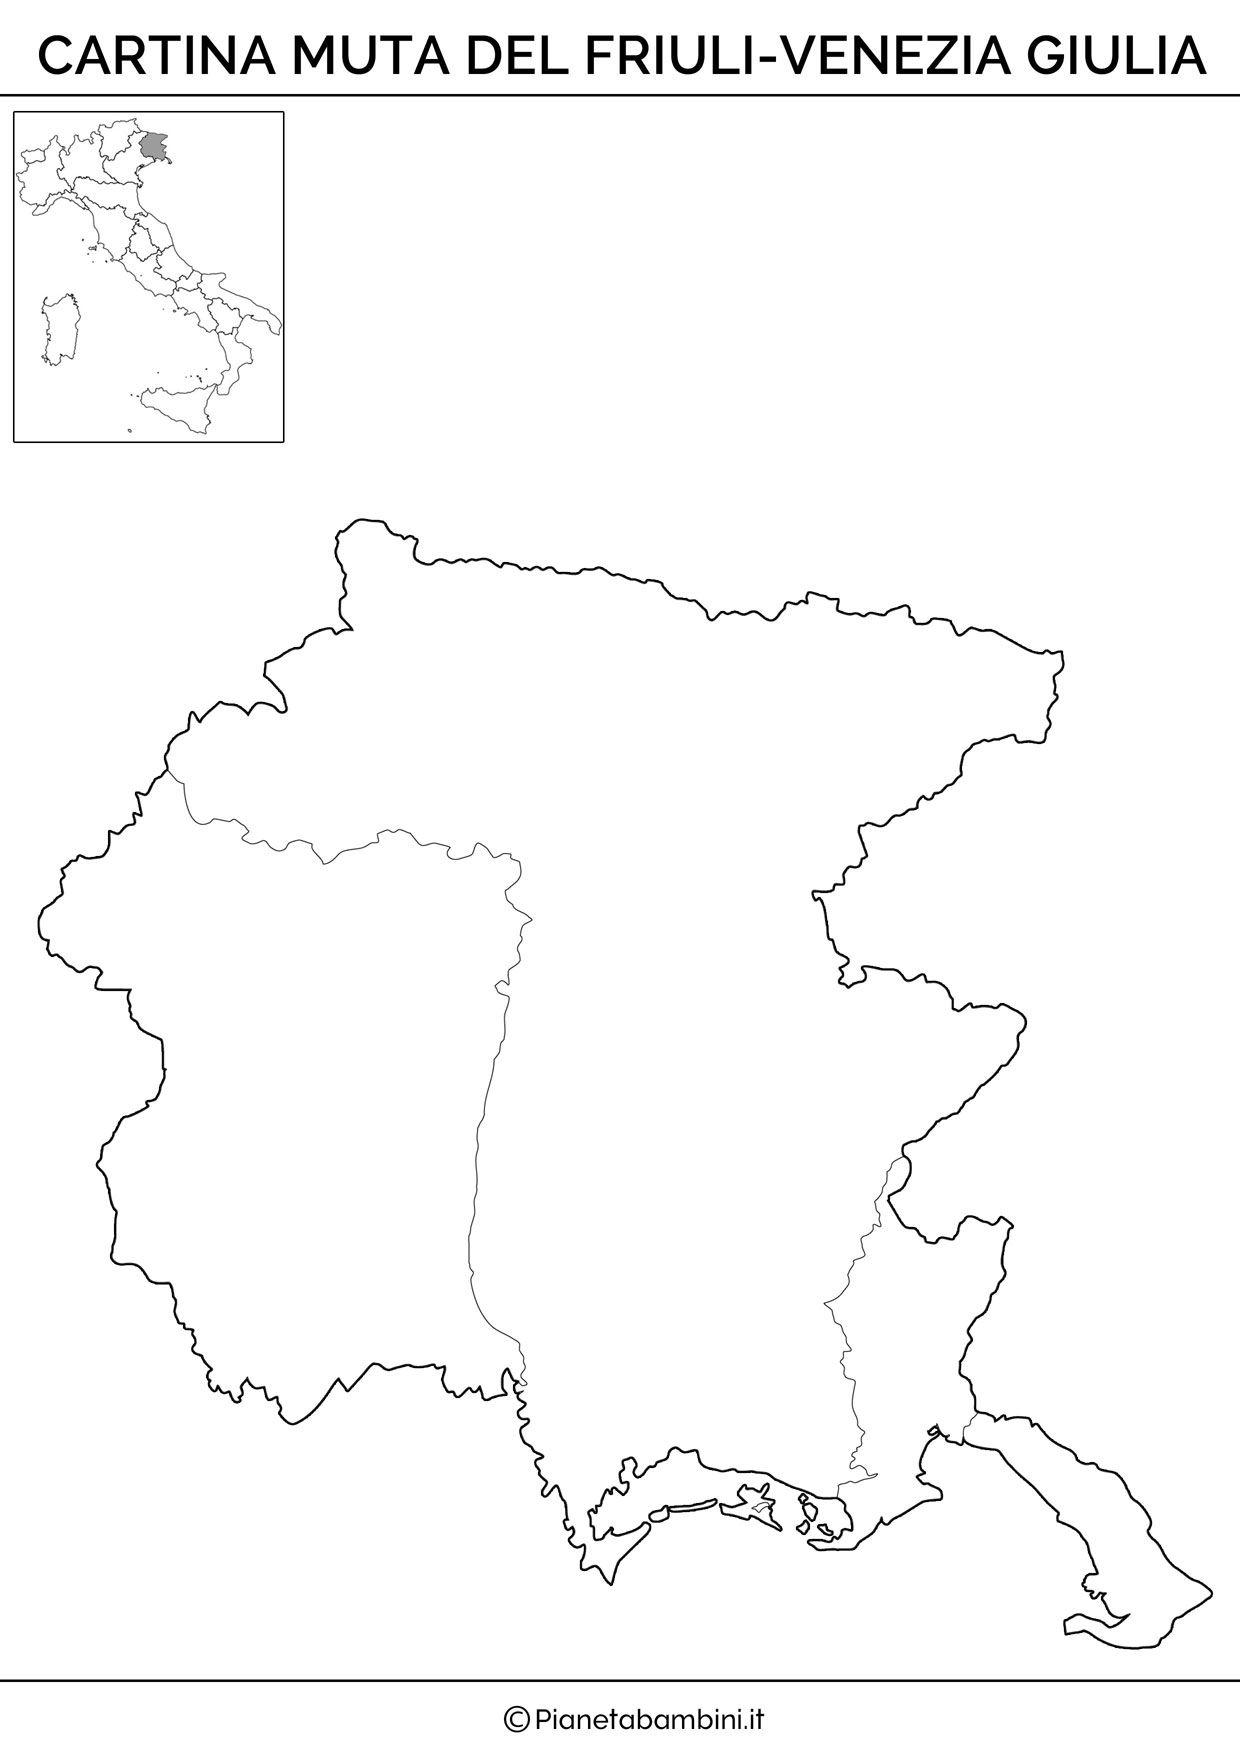 Cartina Muta Regioni Italia.Cartina Muta Fisica E Politica Del Friuli Venezia Giulia Da